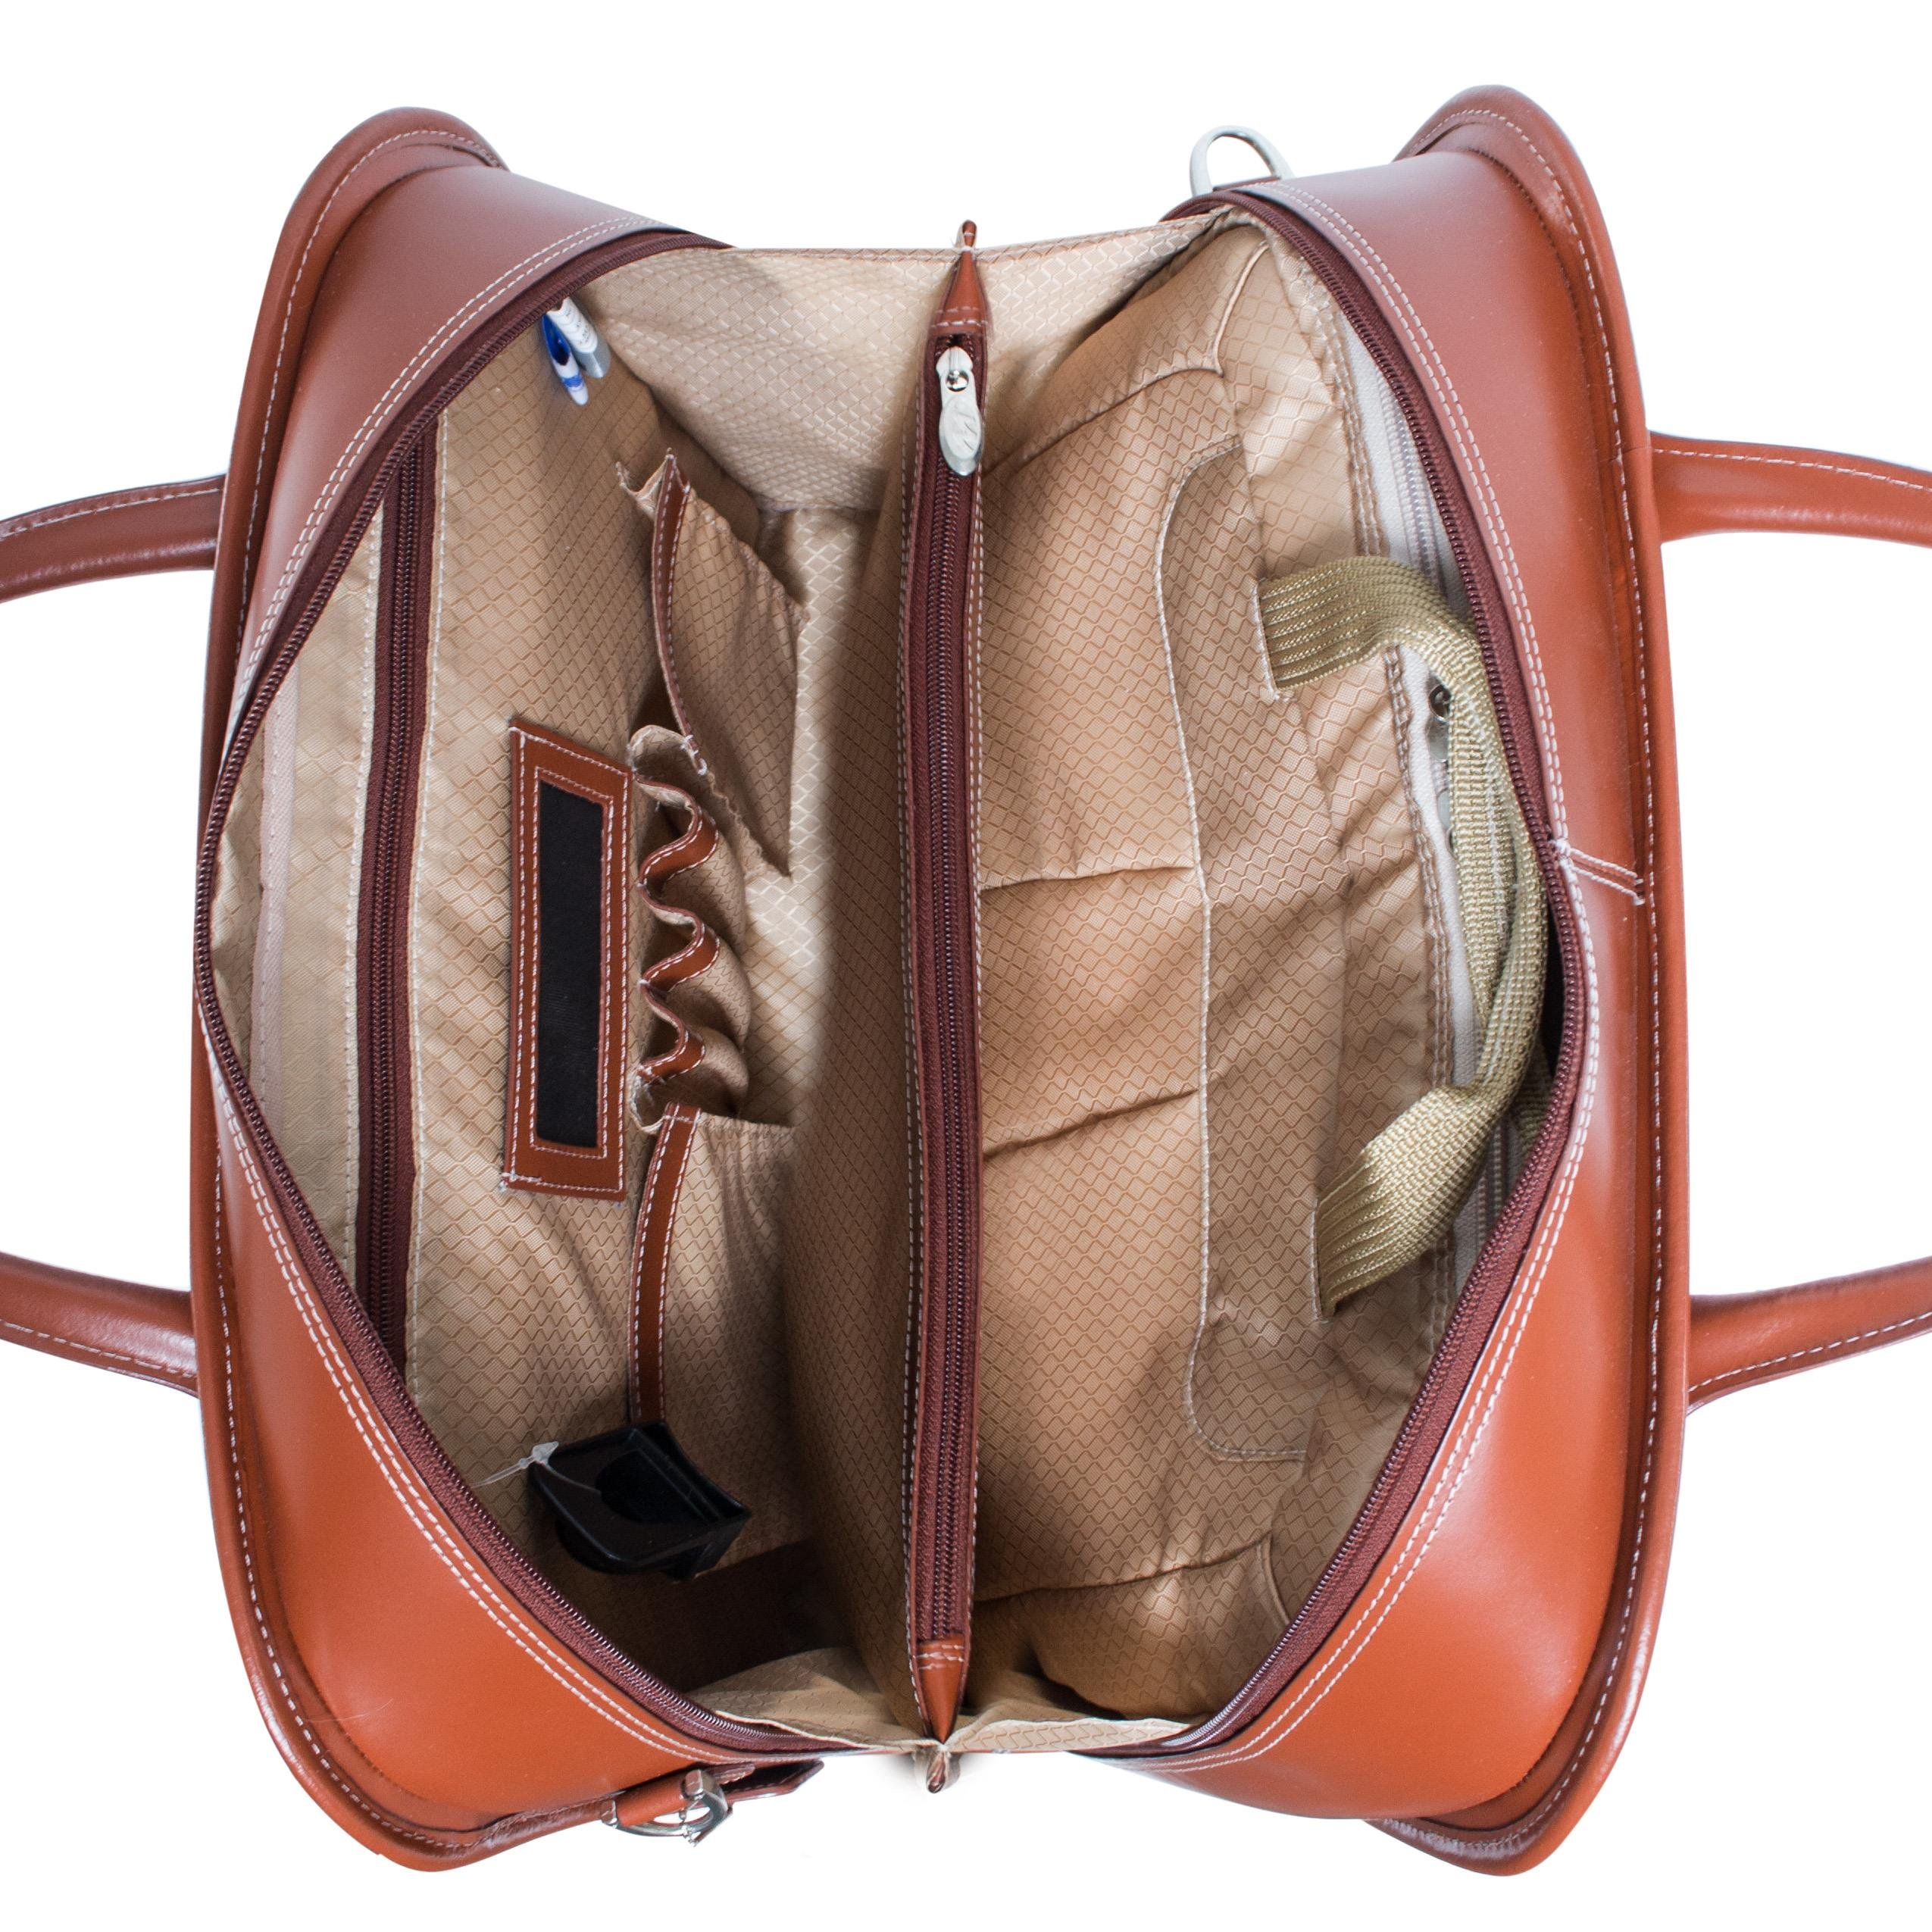 McKleinUSA LAKEWOOD 96615 Black Leather Fly-Through Checkpoint-Friendly Detachable-Wheeled Ladies' Briefcase by McKleinUSA (Image #3)